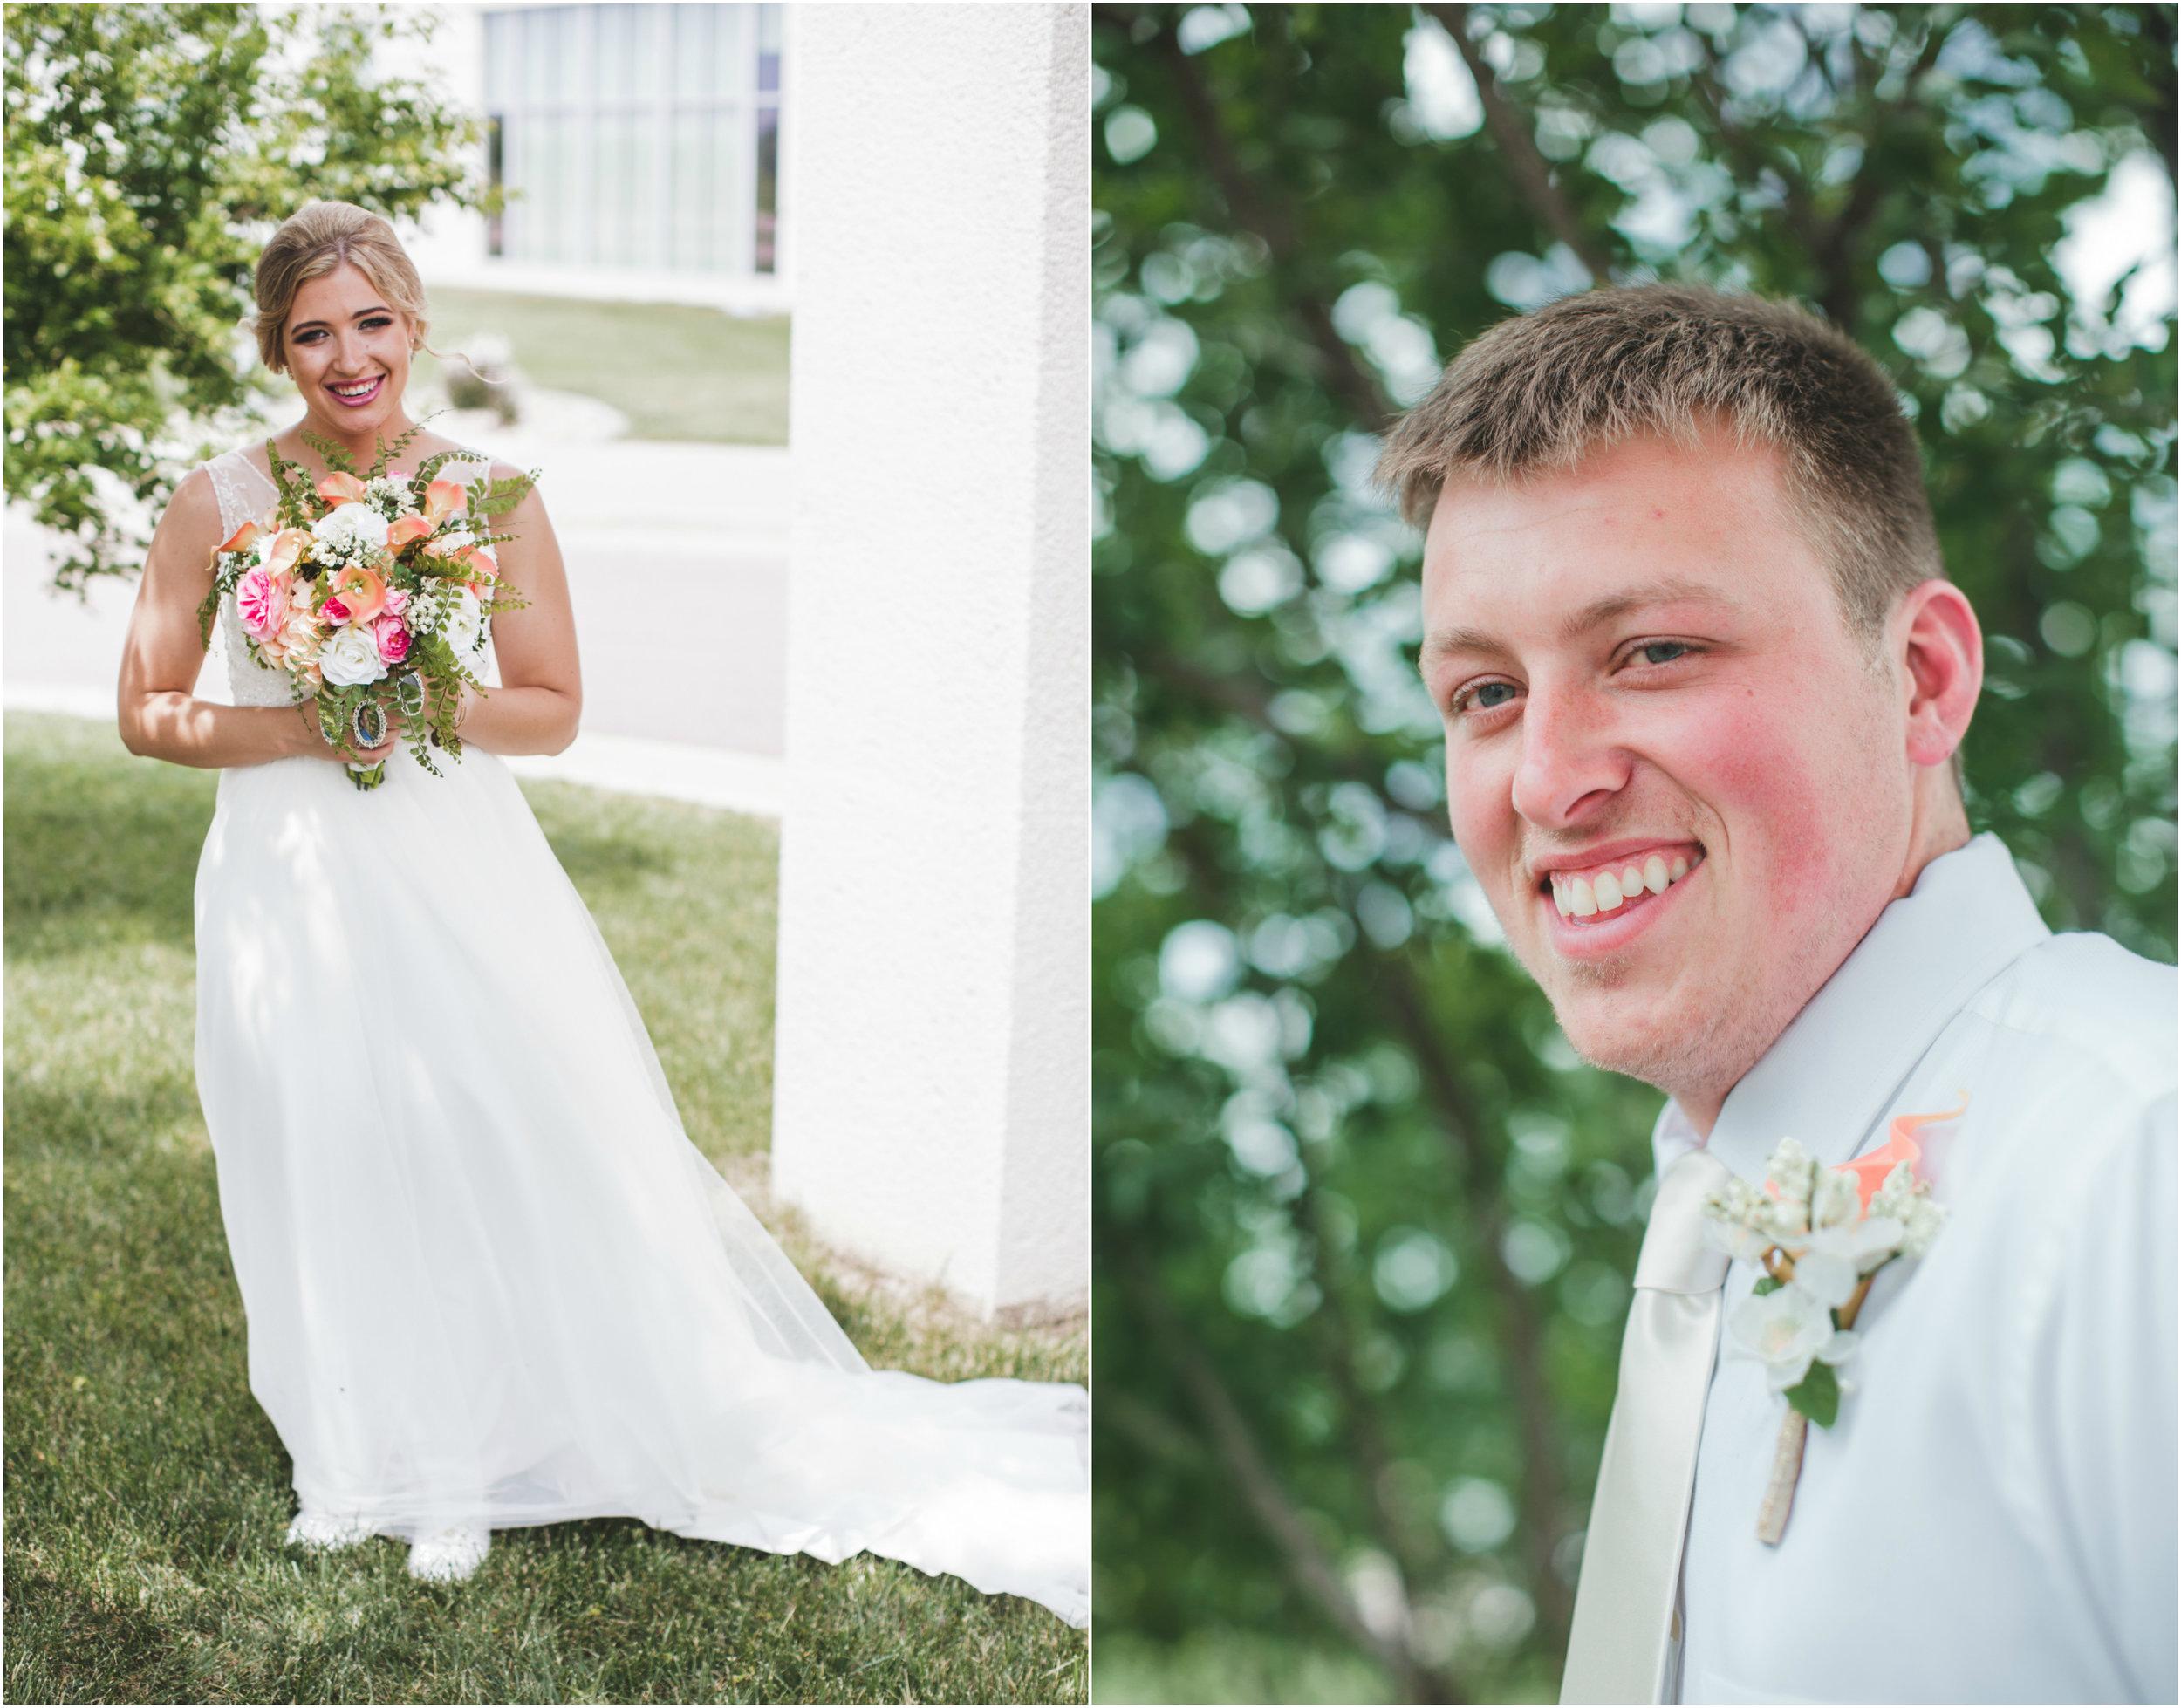 Sioux Falls wedding bride and groom.jpg